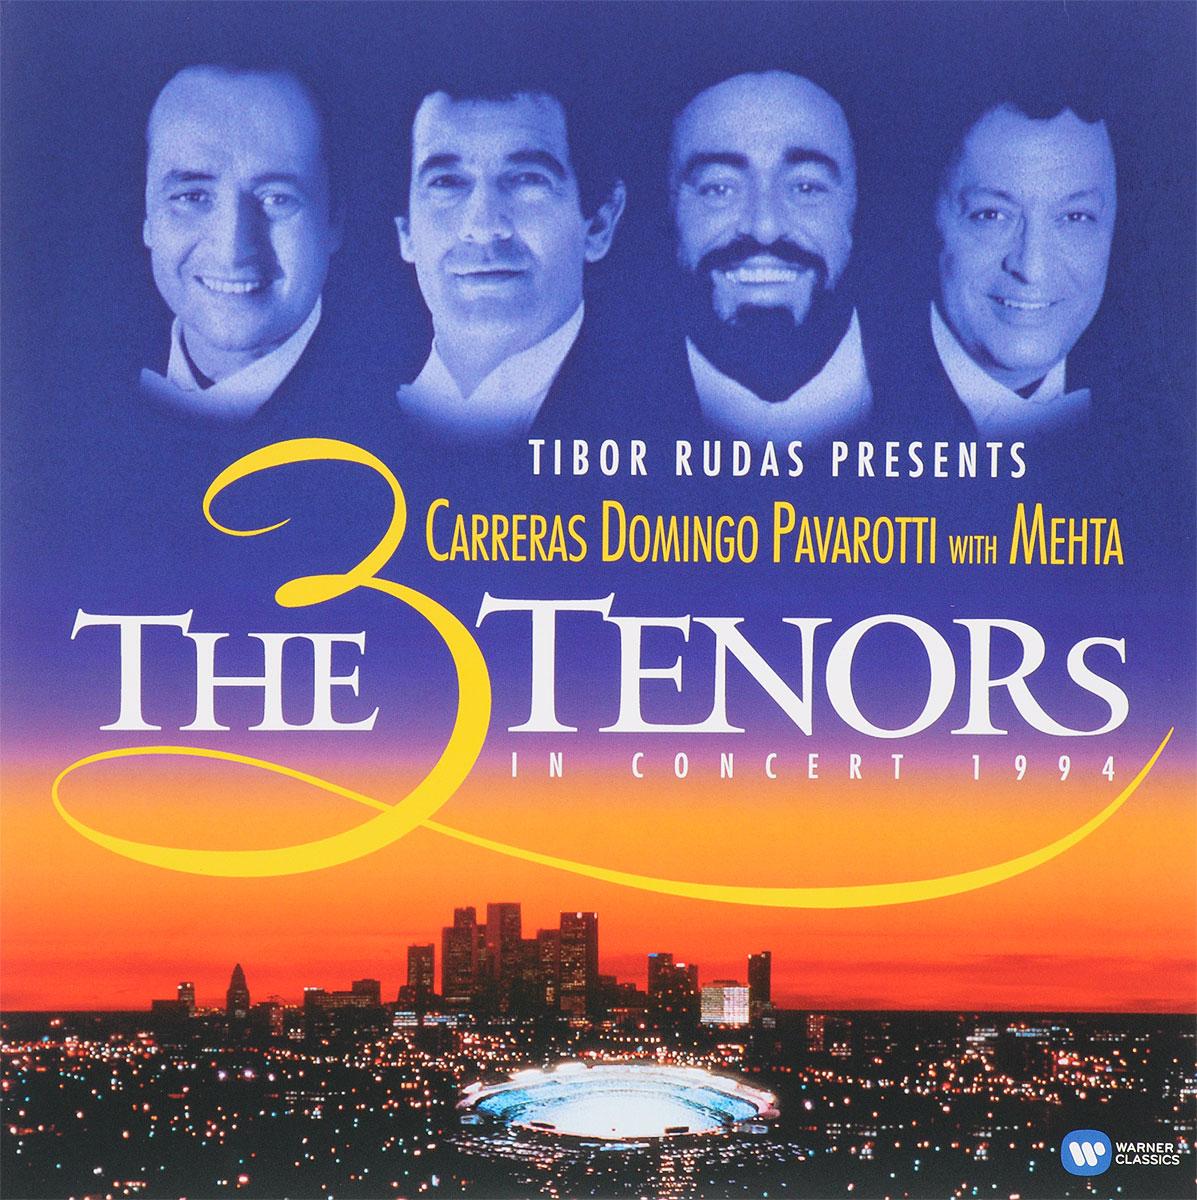 Фото The 3 Tenors,Хосе Каррерас,Плачидо Доминго,Лучано Паваротти,Зубин Мета,The Los Angeles Philharmonic,Los Angeles Music Center Opera Chorus The 3 Tenors. The 3 Tenors In Concert 1994 (2 LP)